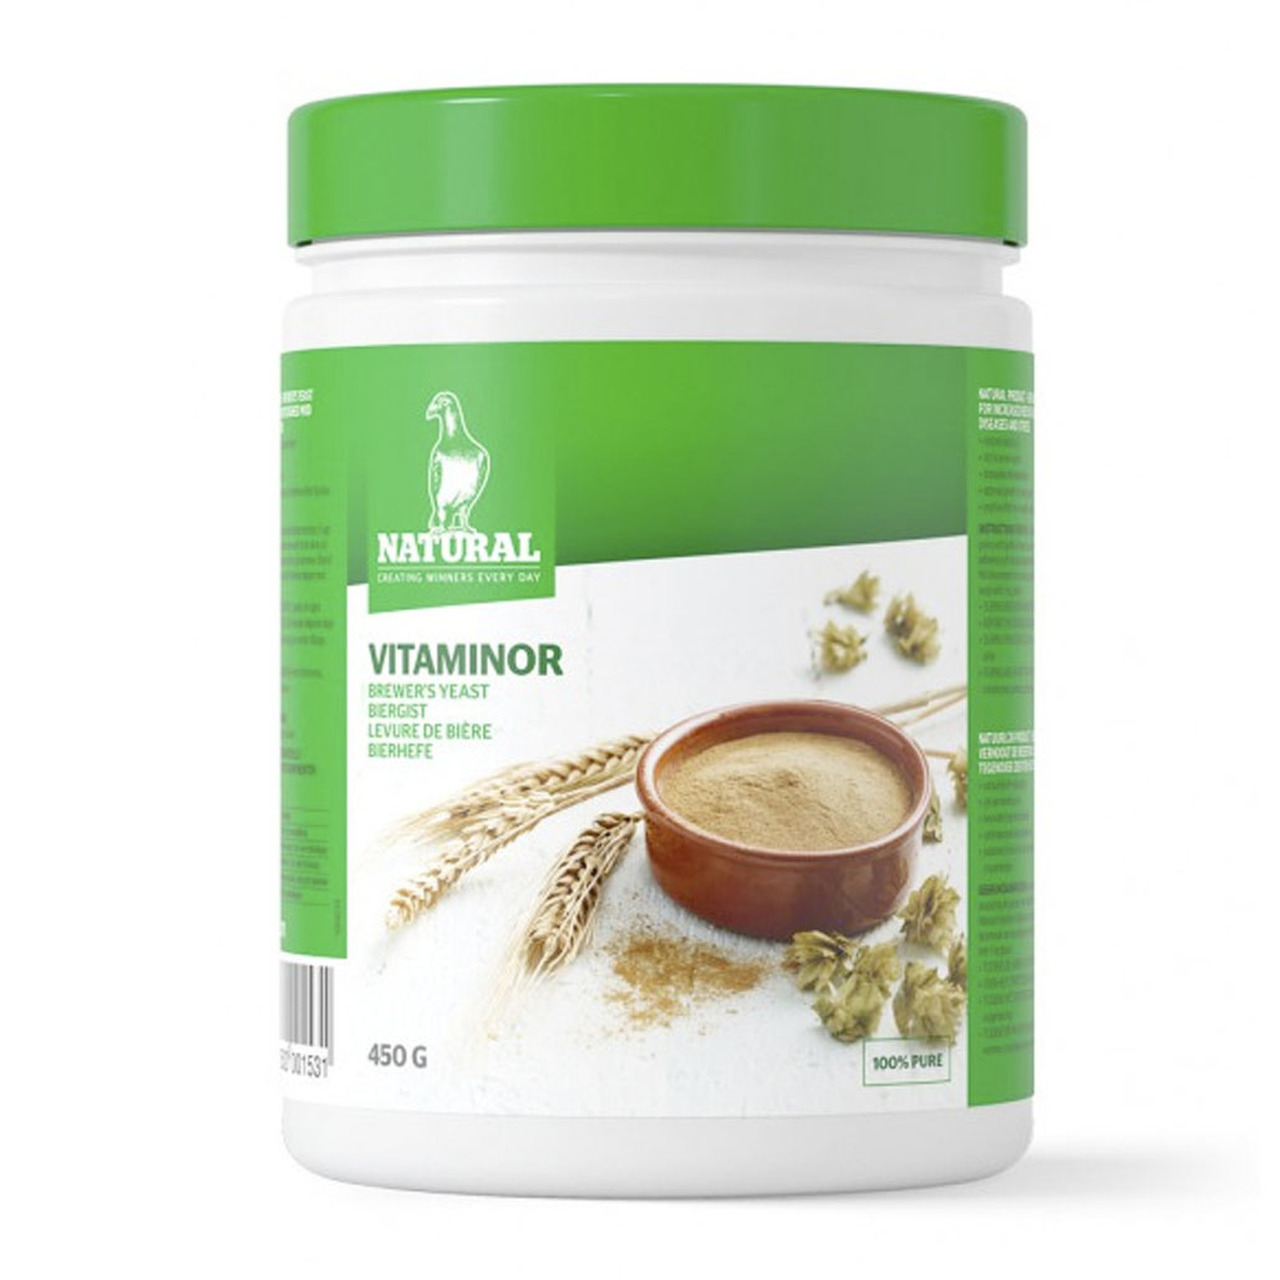 Natural's Vitaminor Brewer's Yeast